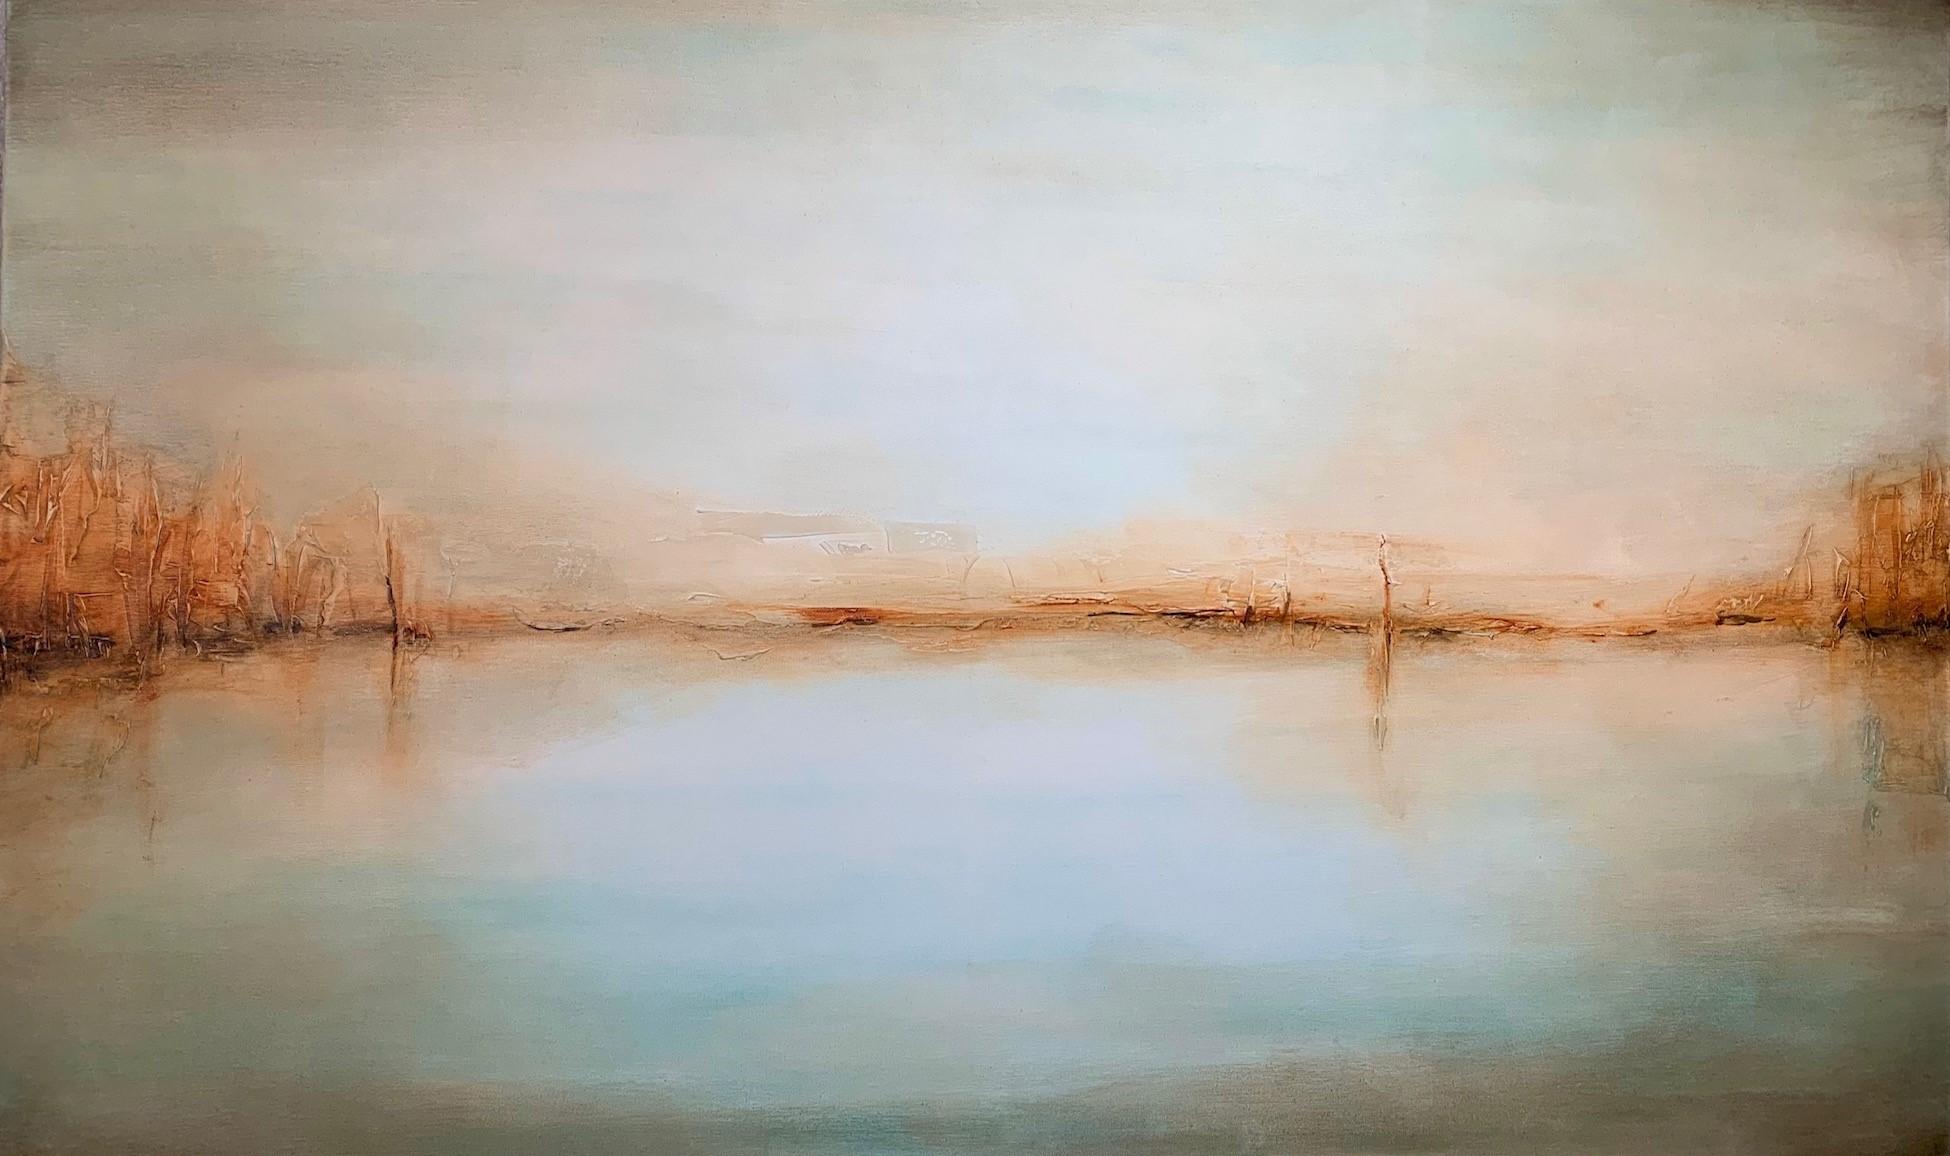 Le Pont_Sonja Riemer Art